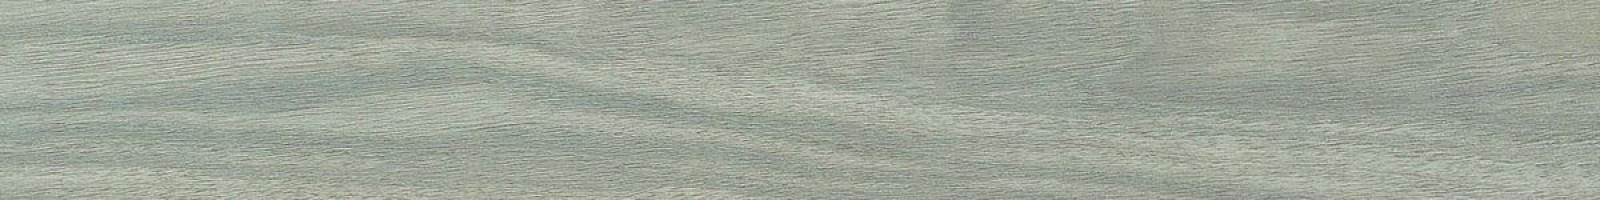 Керамогранит 741879 Wooden Gray Naturale 15x120 Casa Dolce Casa